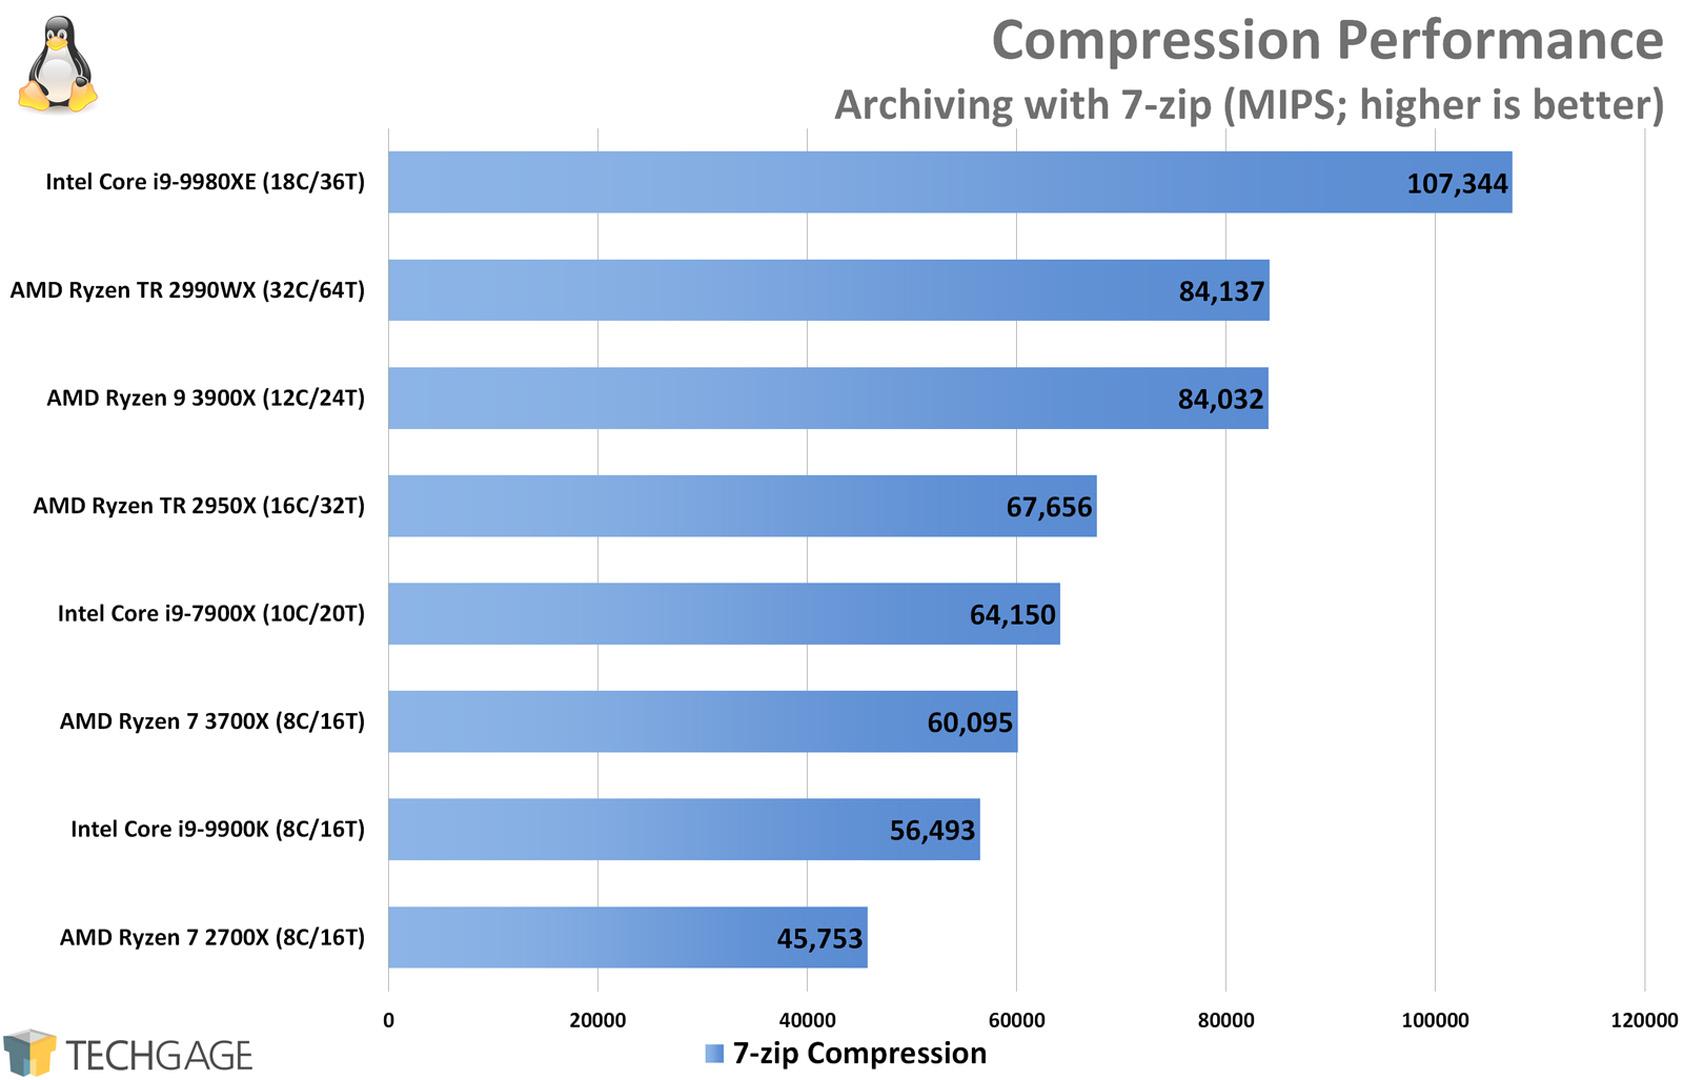 Compression Performance (Linux 7-Zip, AMD Ryzen 9 3900X and 7 3700X)